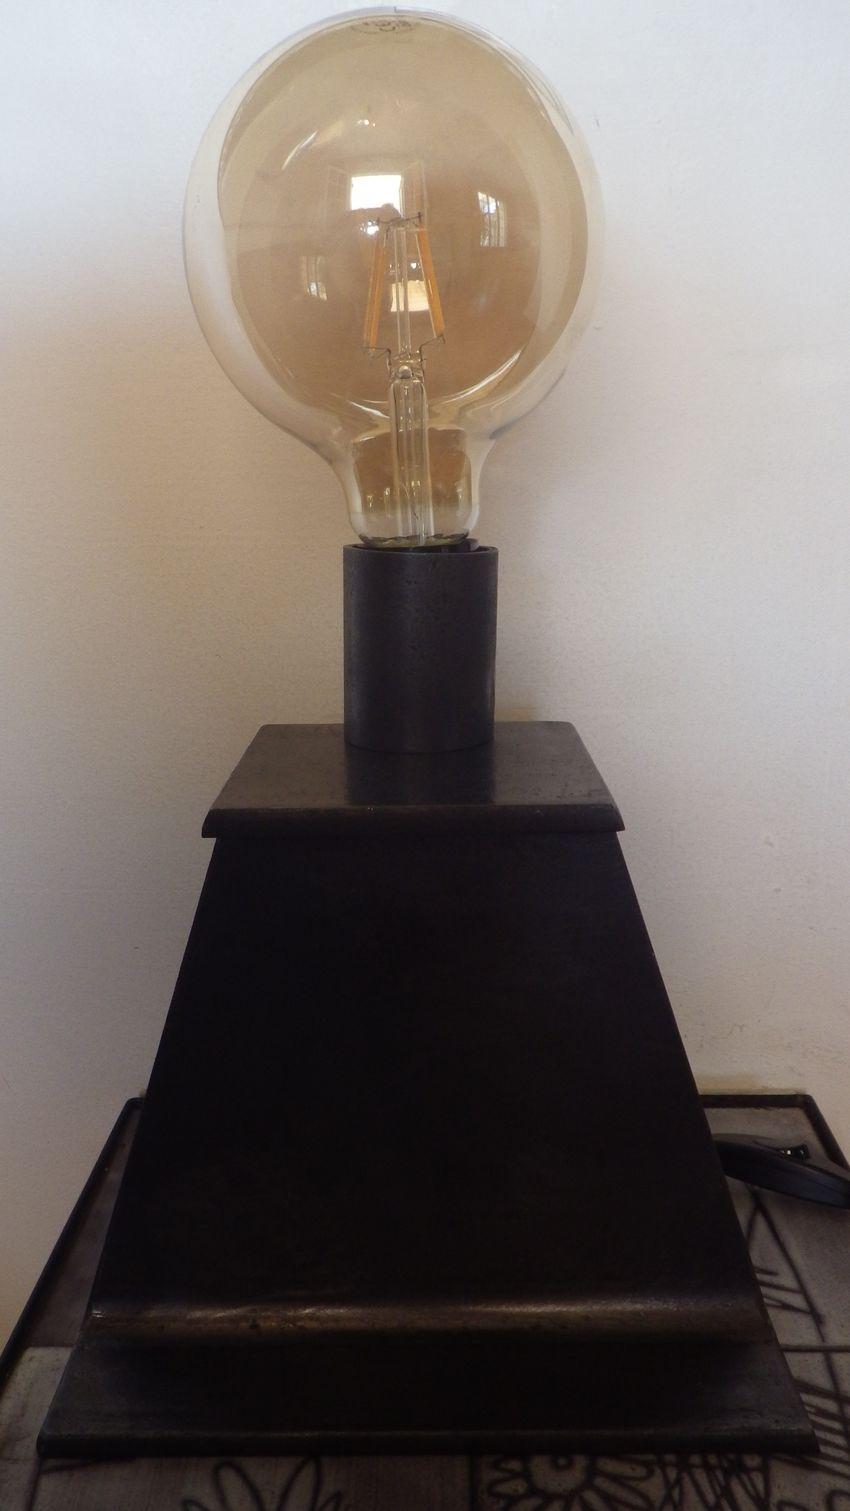 lampe poser en acier ipn luminaire de style industriel loft. Black Bedroom Furniture Sets. Home Design Ideas